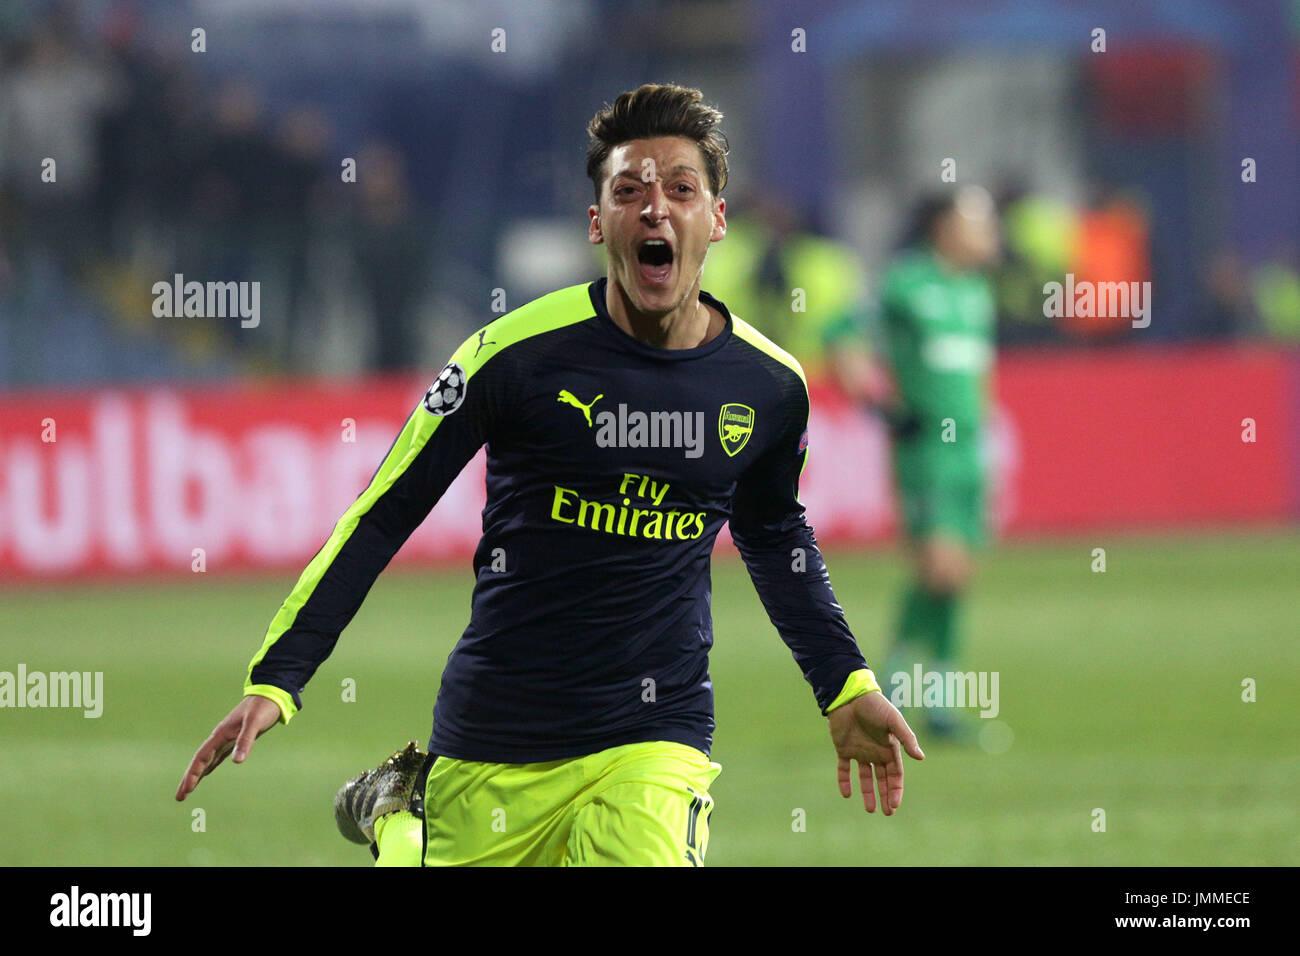 Sofia, Bulgaria - November 1, 2016: Arsenal's Mesut Ozil celebrates after scoring a goal during UEFA Champions League football match between Ludogorets Razgrad and Arsenal at Bulgaria's National Stadium. - Stock Image